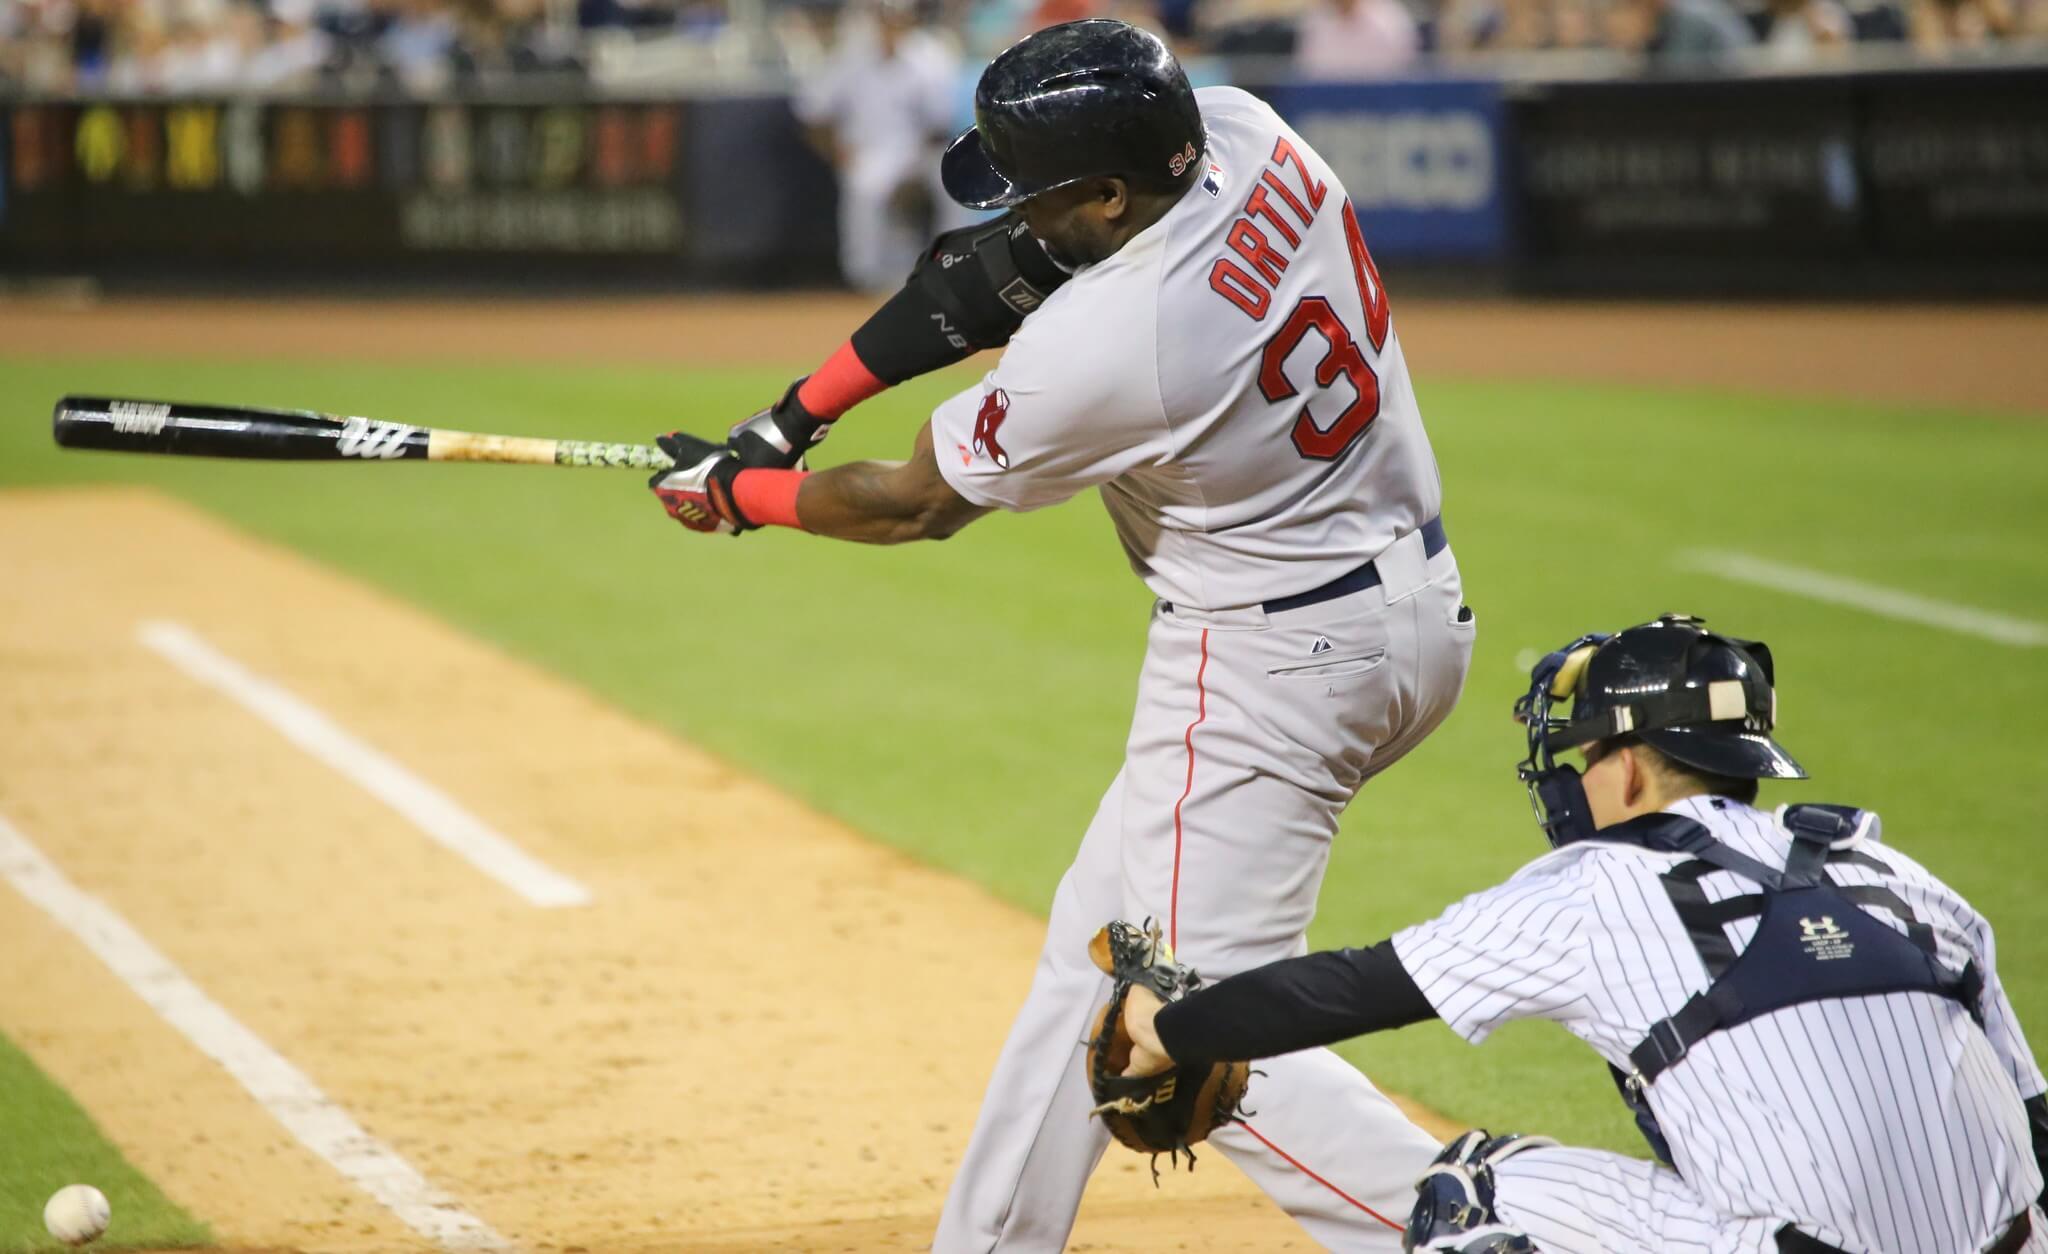 Boston Red Sox vs New York Yankees MLB baseball